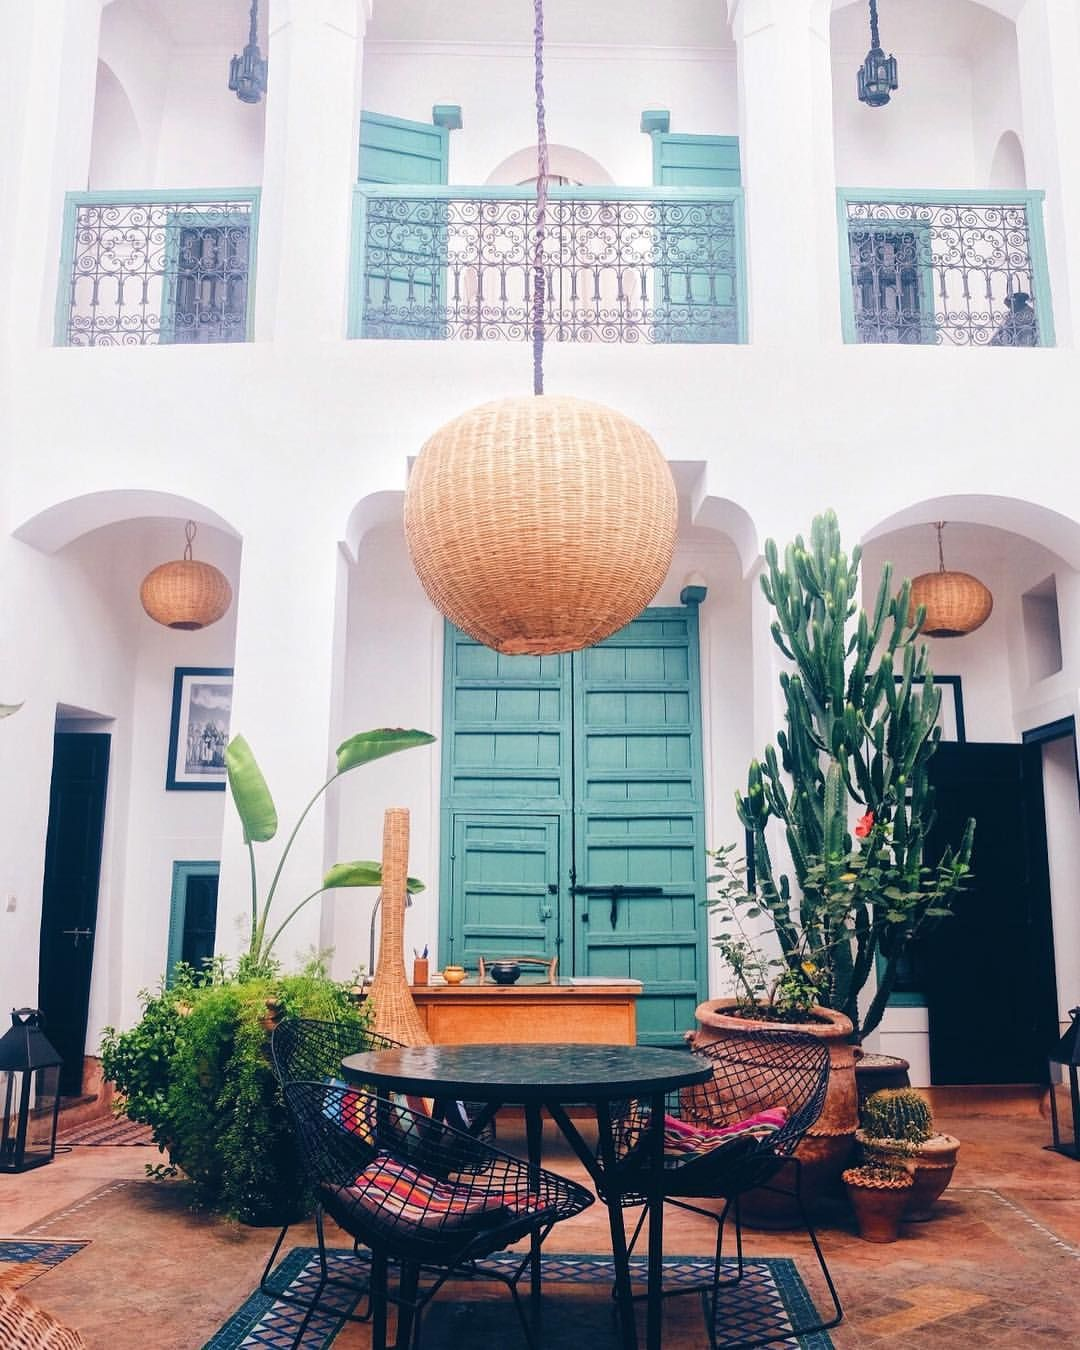 Places to stay in Marrakech   L'Oranger de la Medina riad